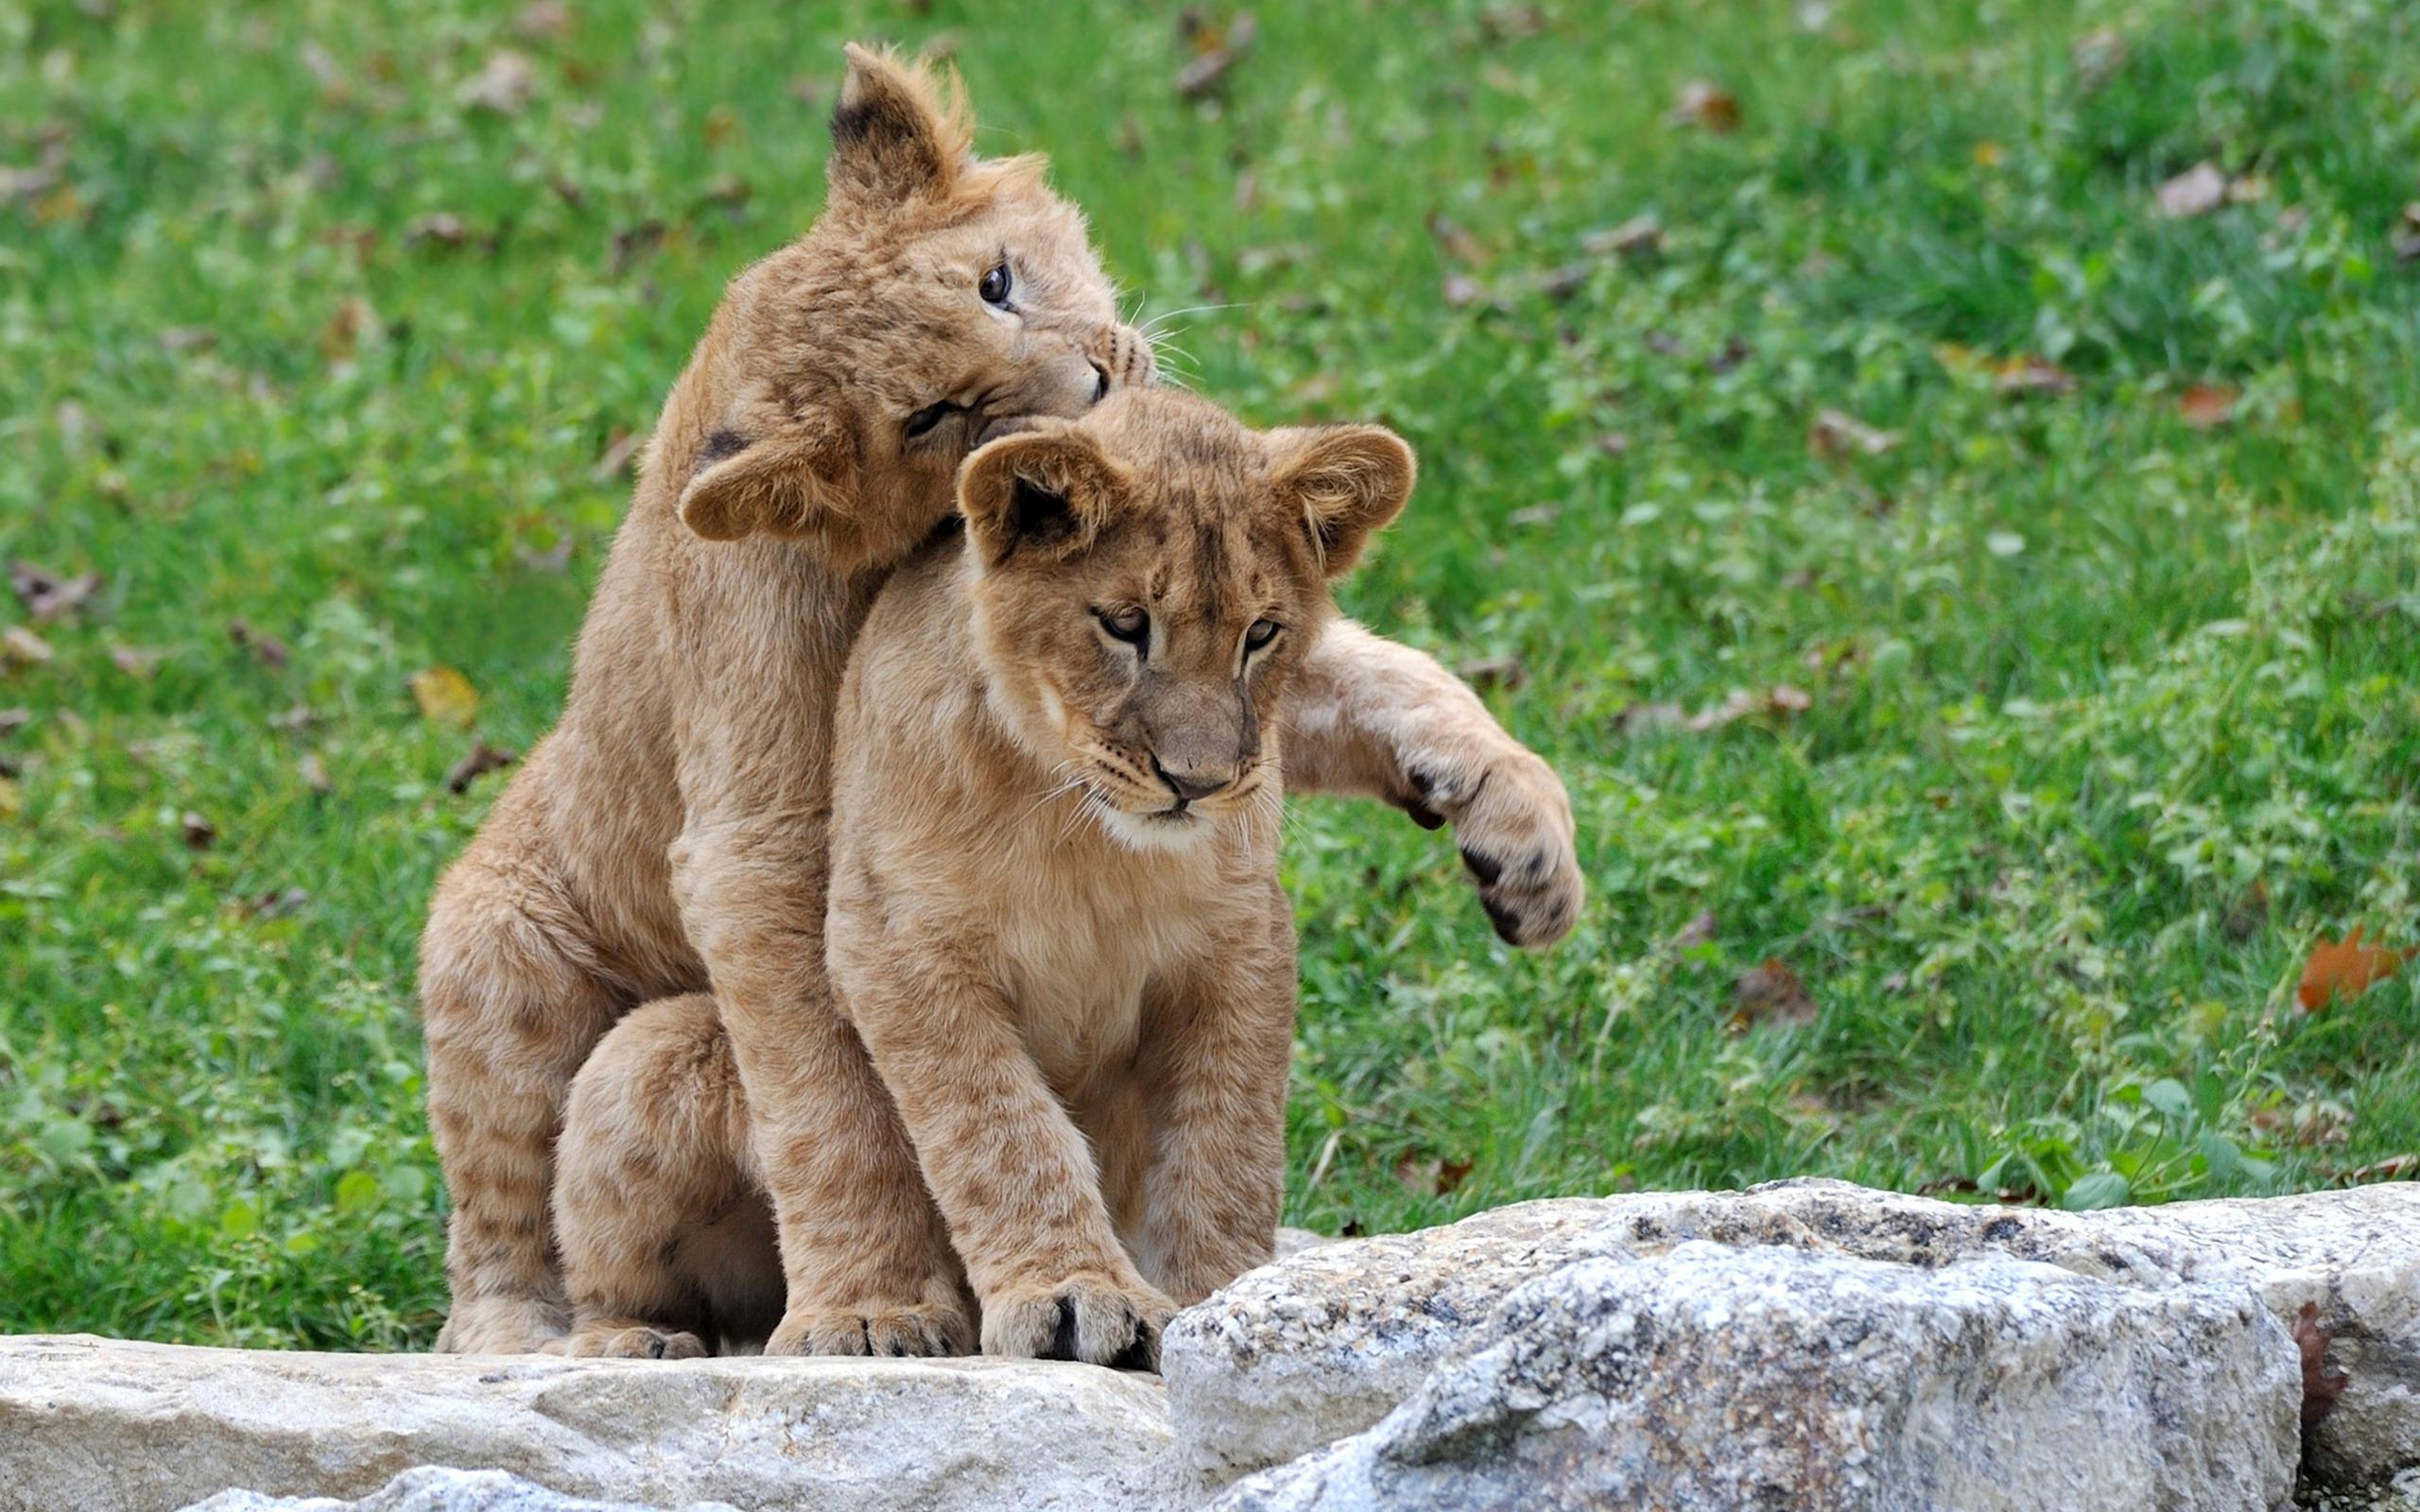 Lion cubs wallpaper 31124 2560x1600